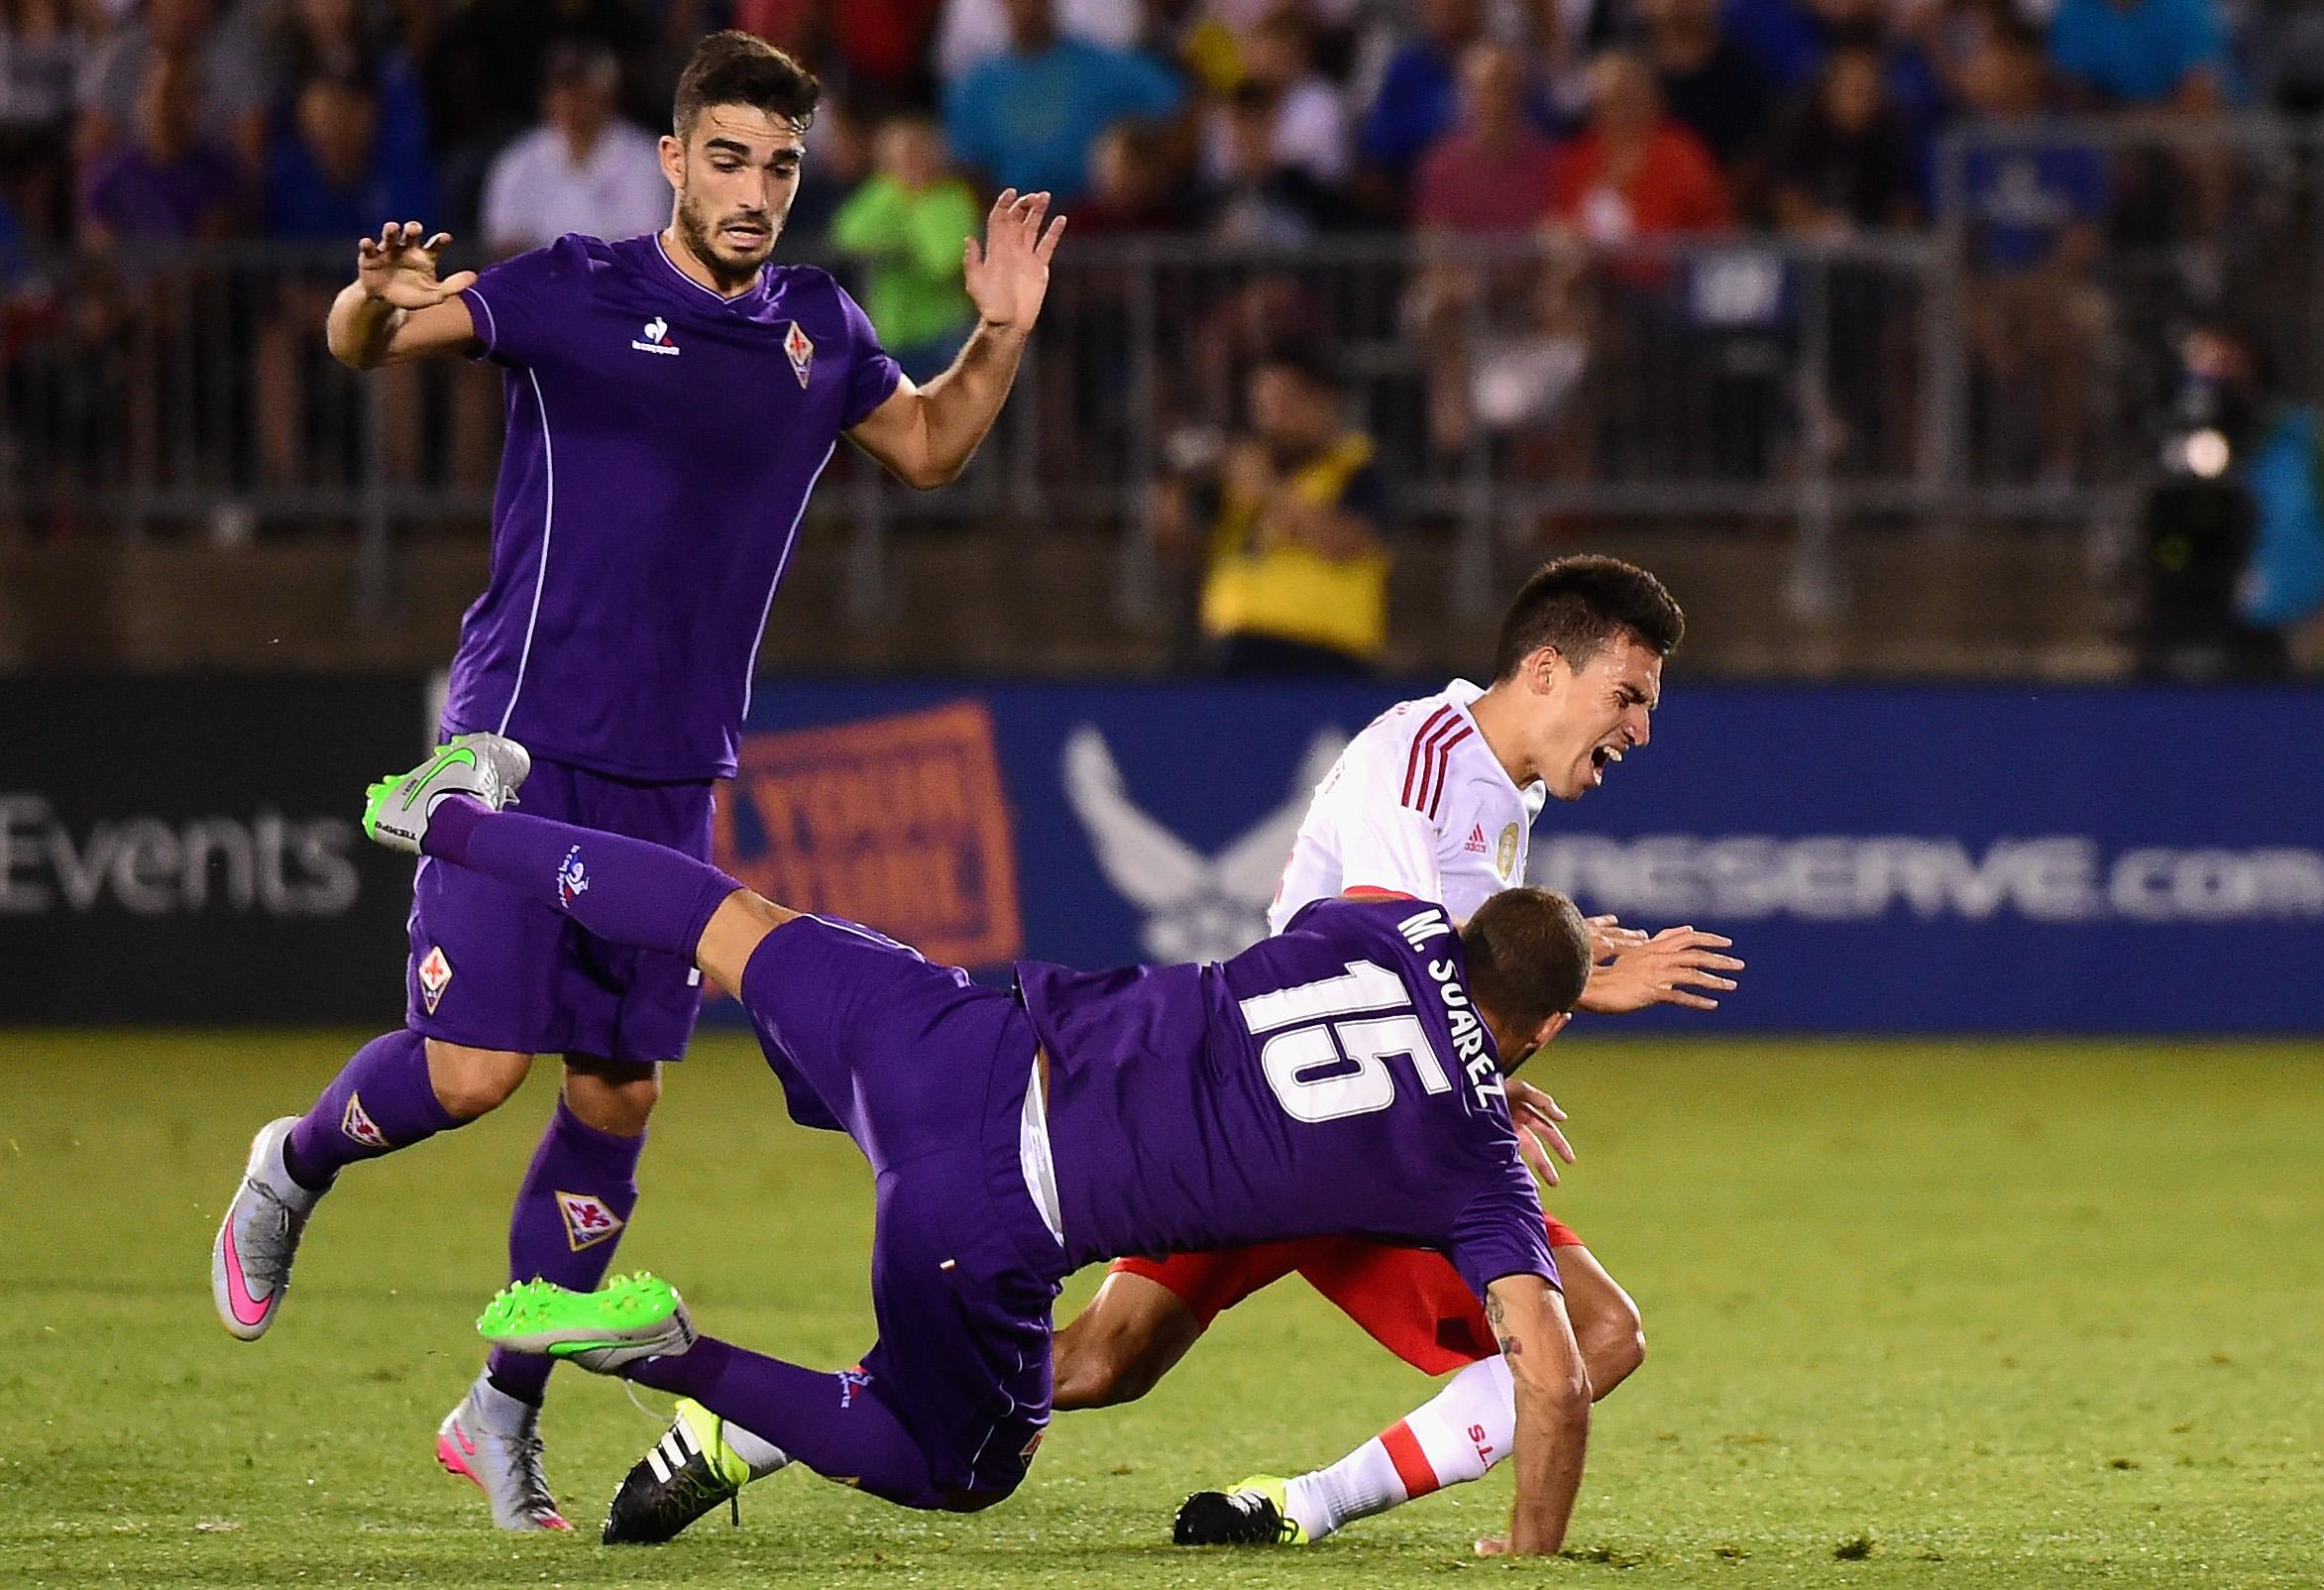 International Champions Cup 2015 - AFC Fiorentina v Benfica